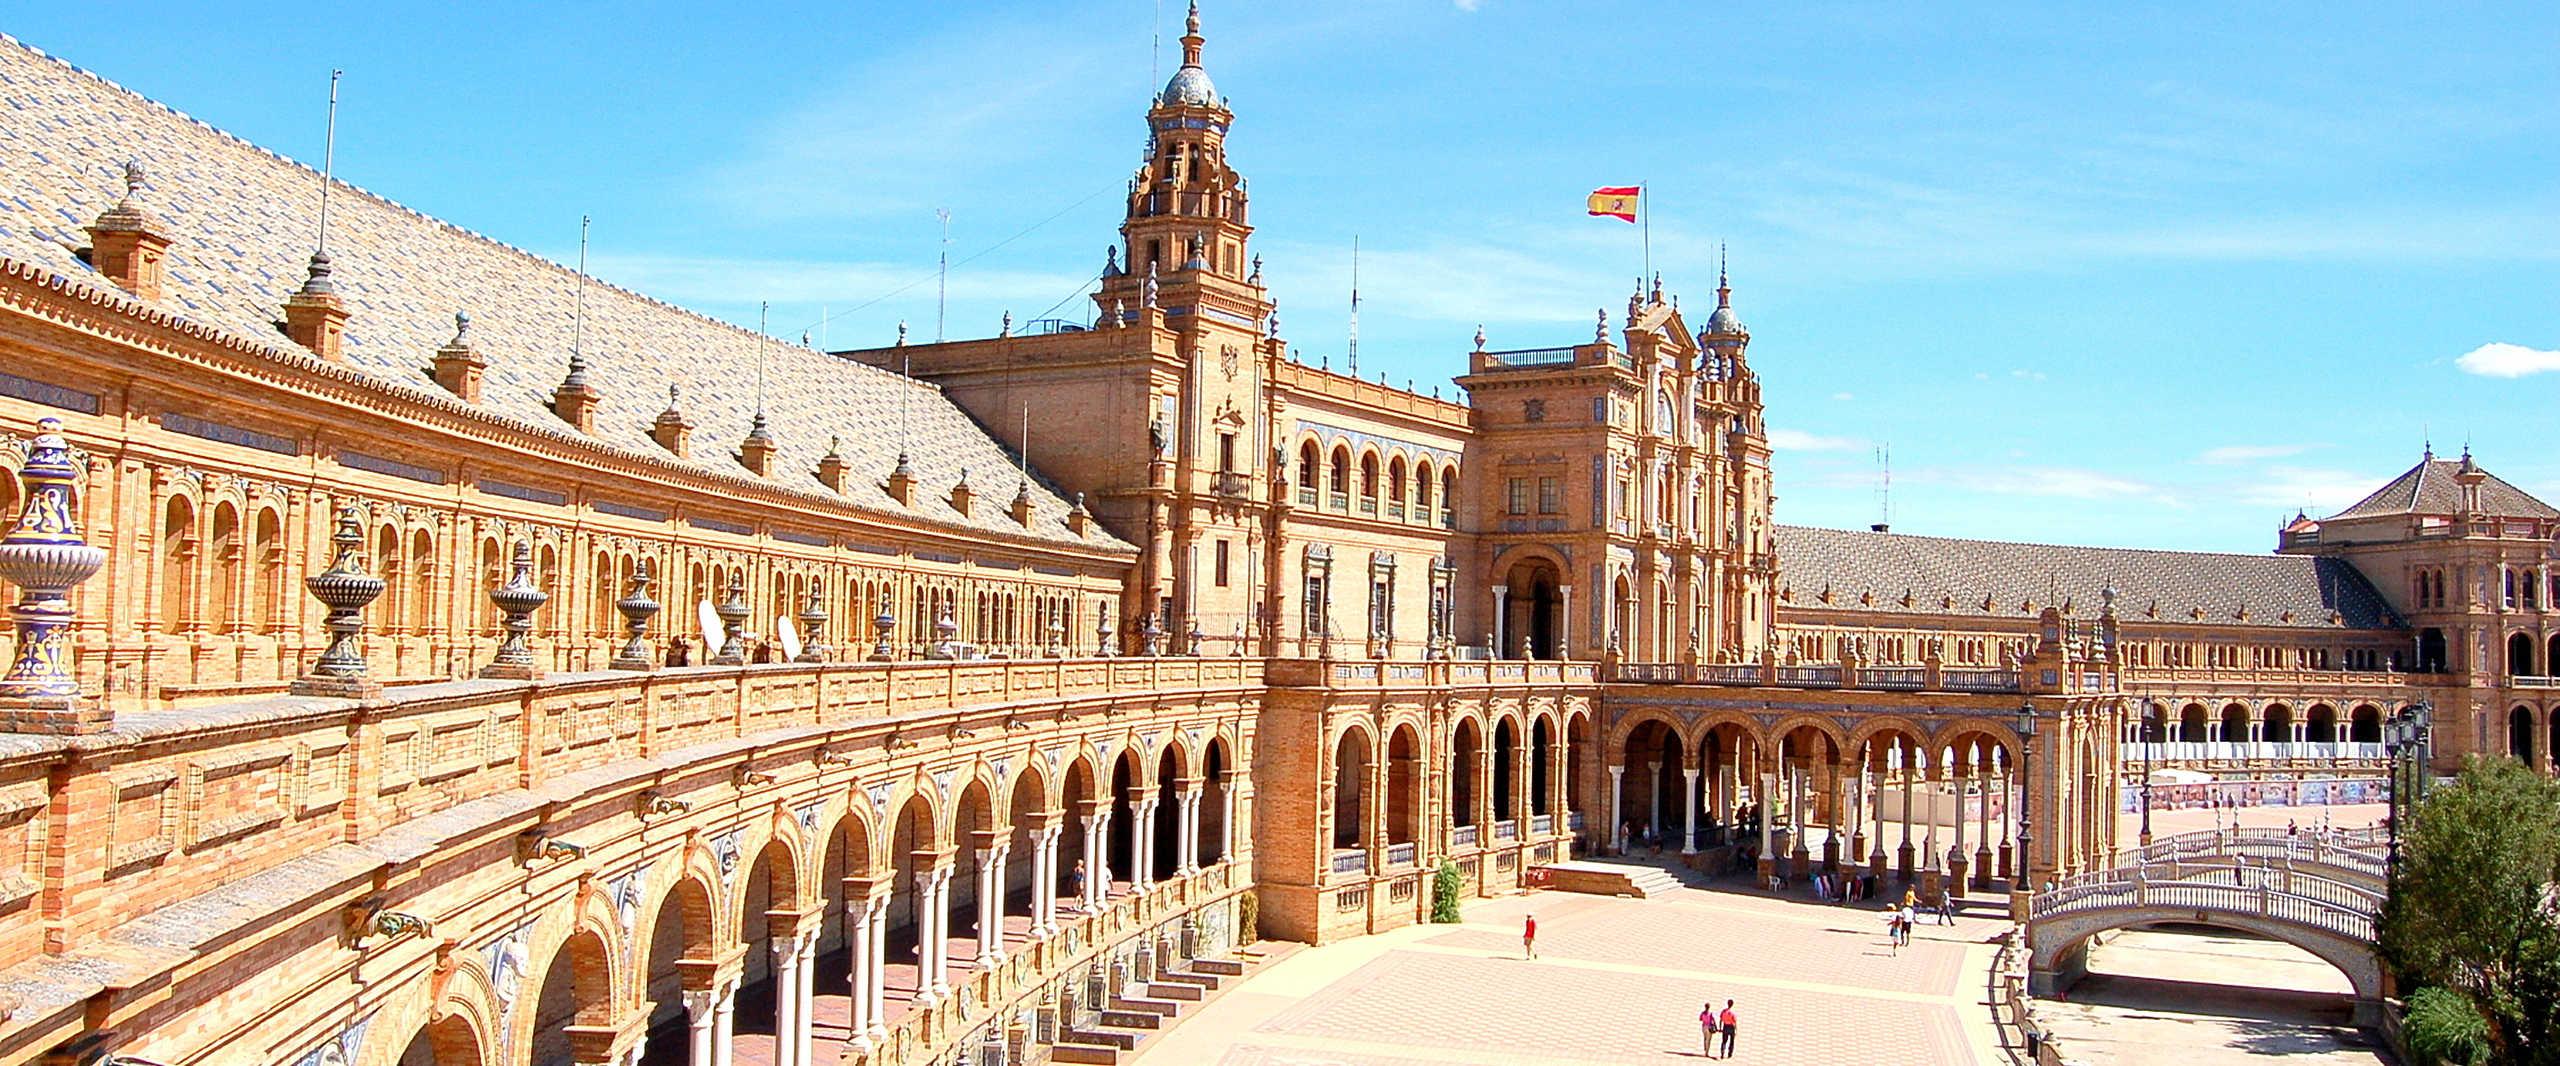 Praca de Espana in Sevilla